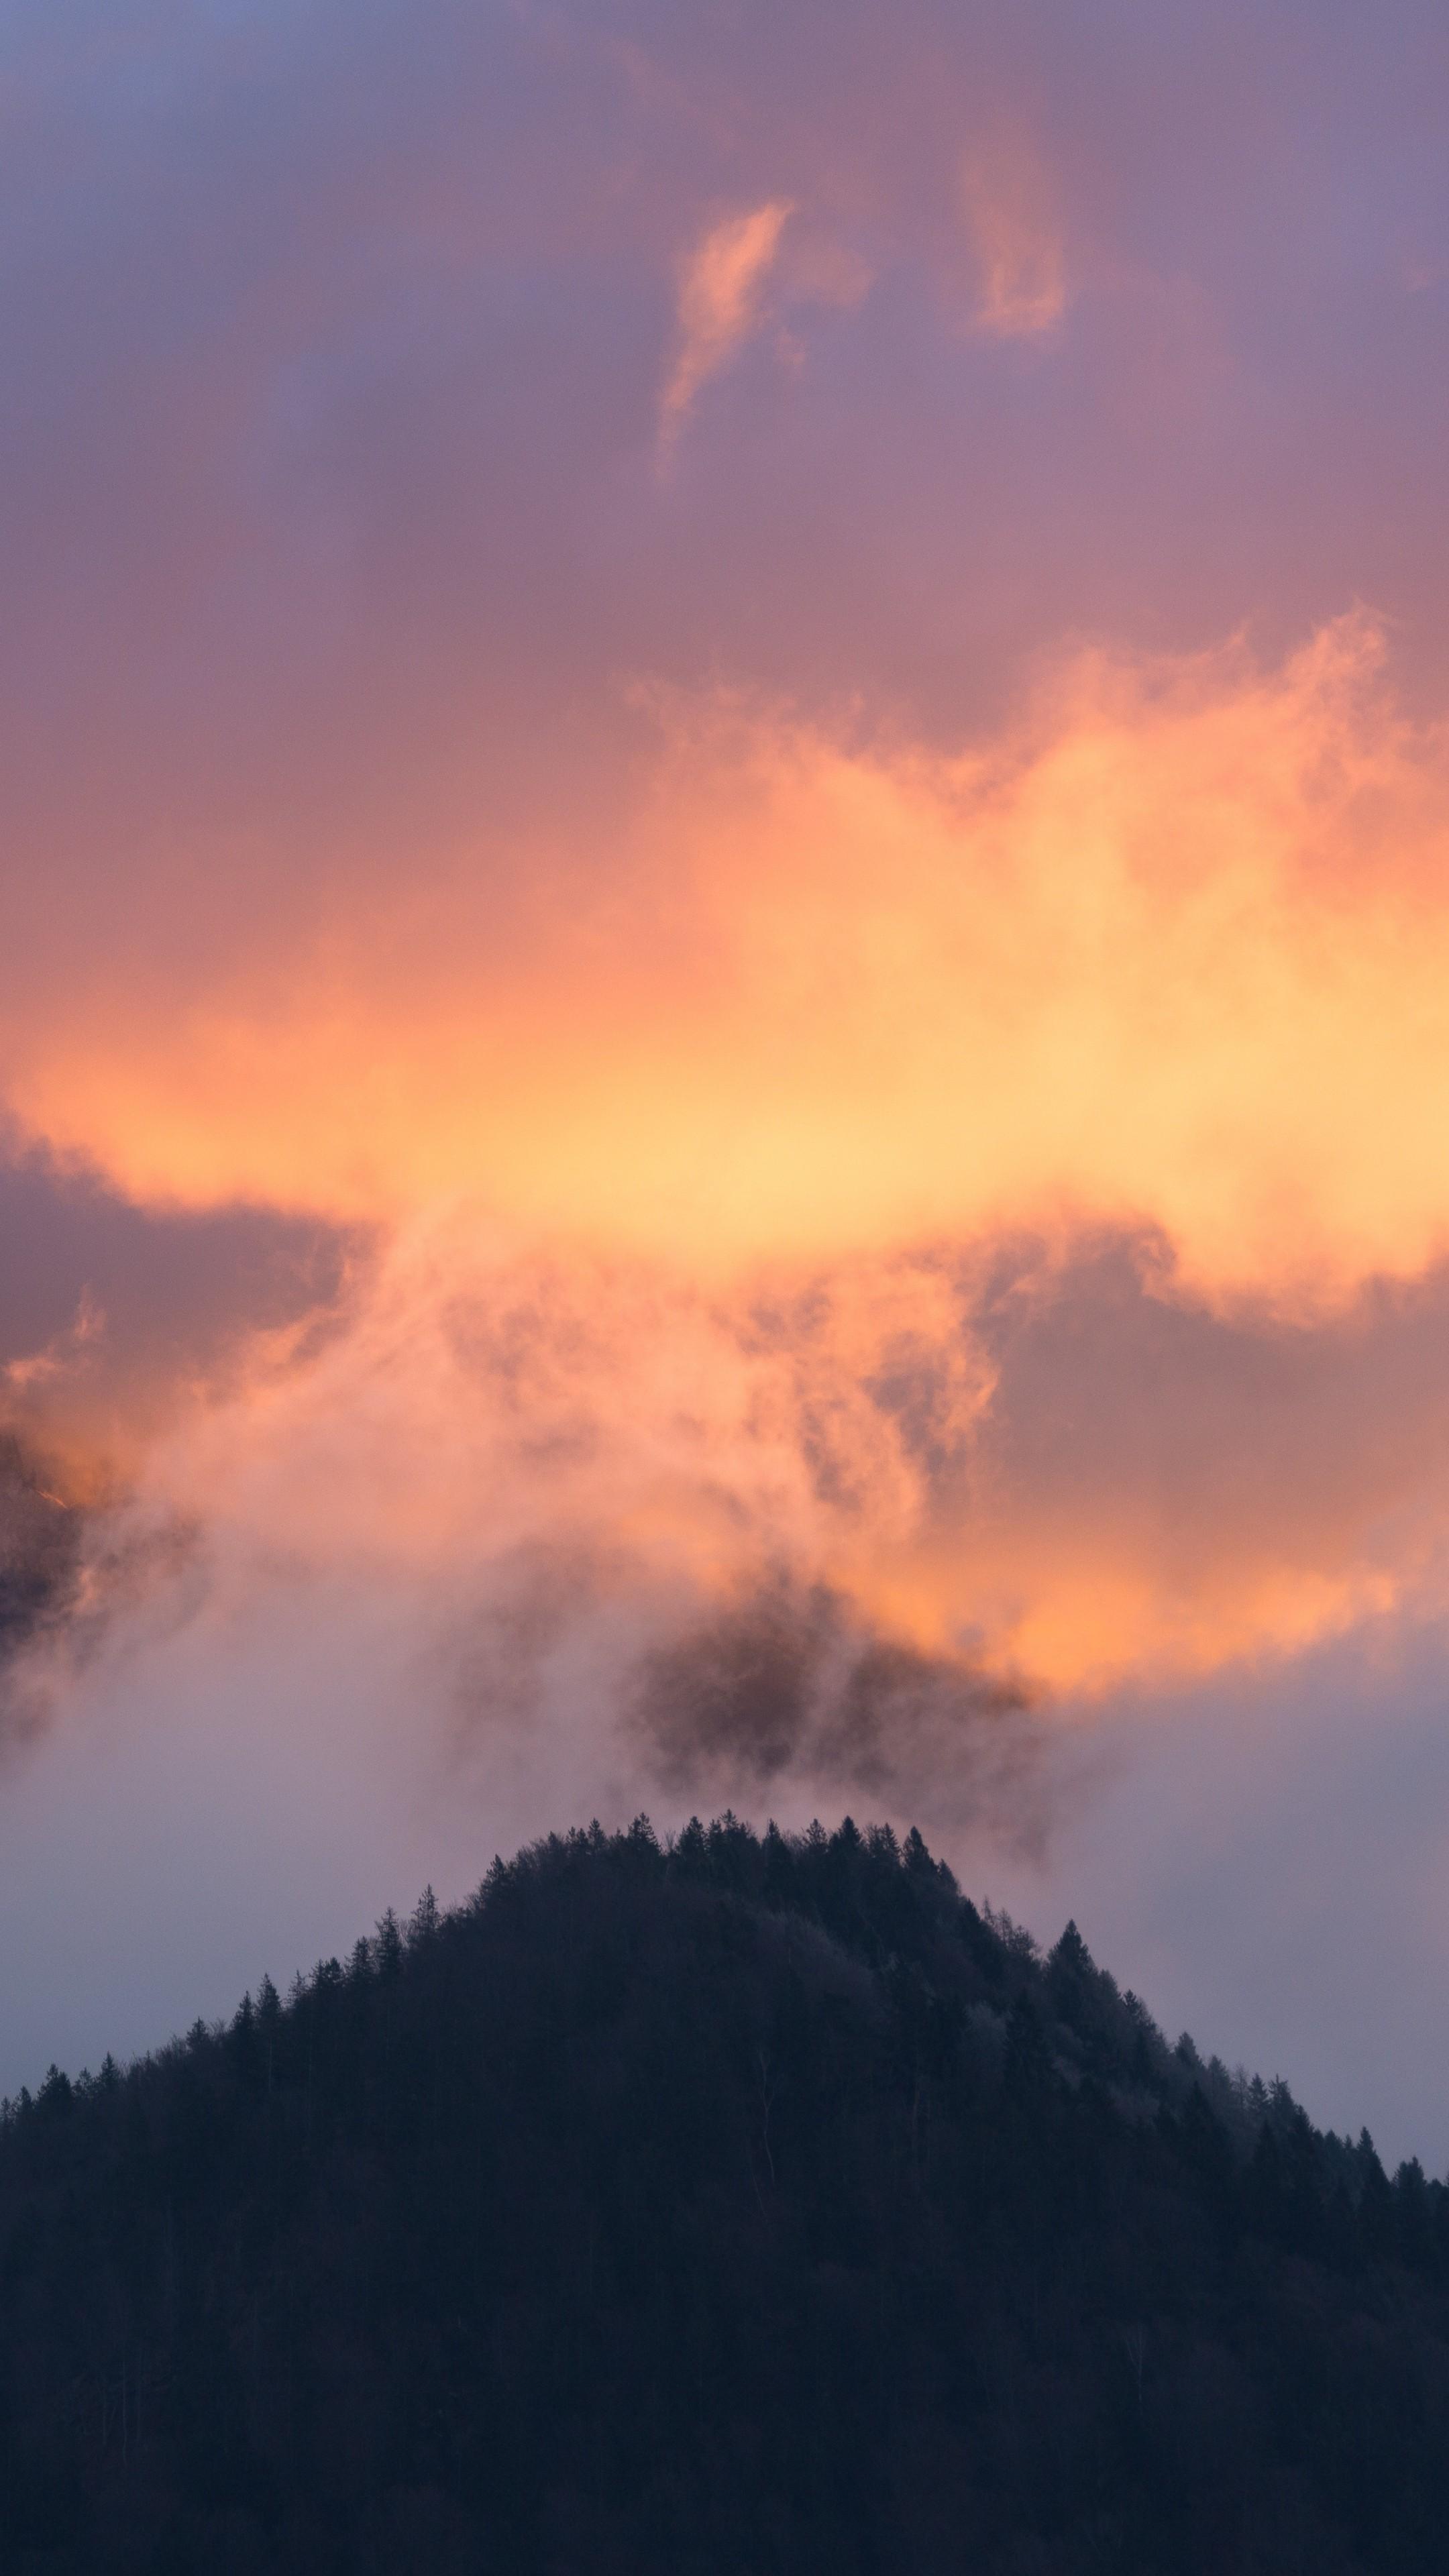 Mountains Fog Sky Trees Sunset Wallpaper - [2160x3840]